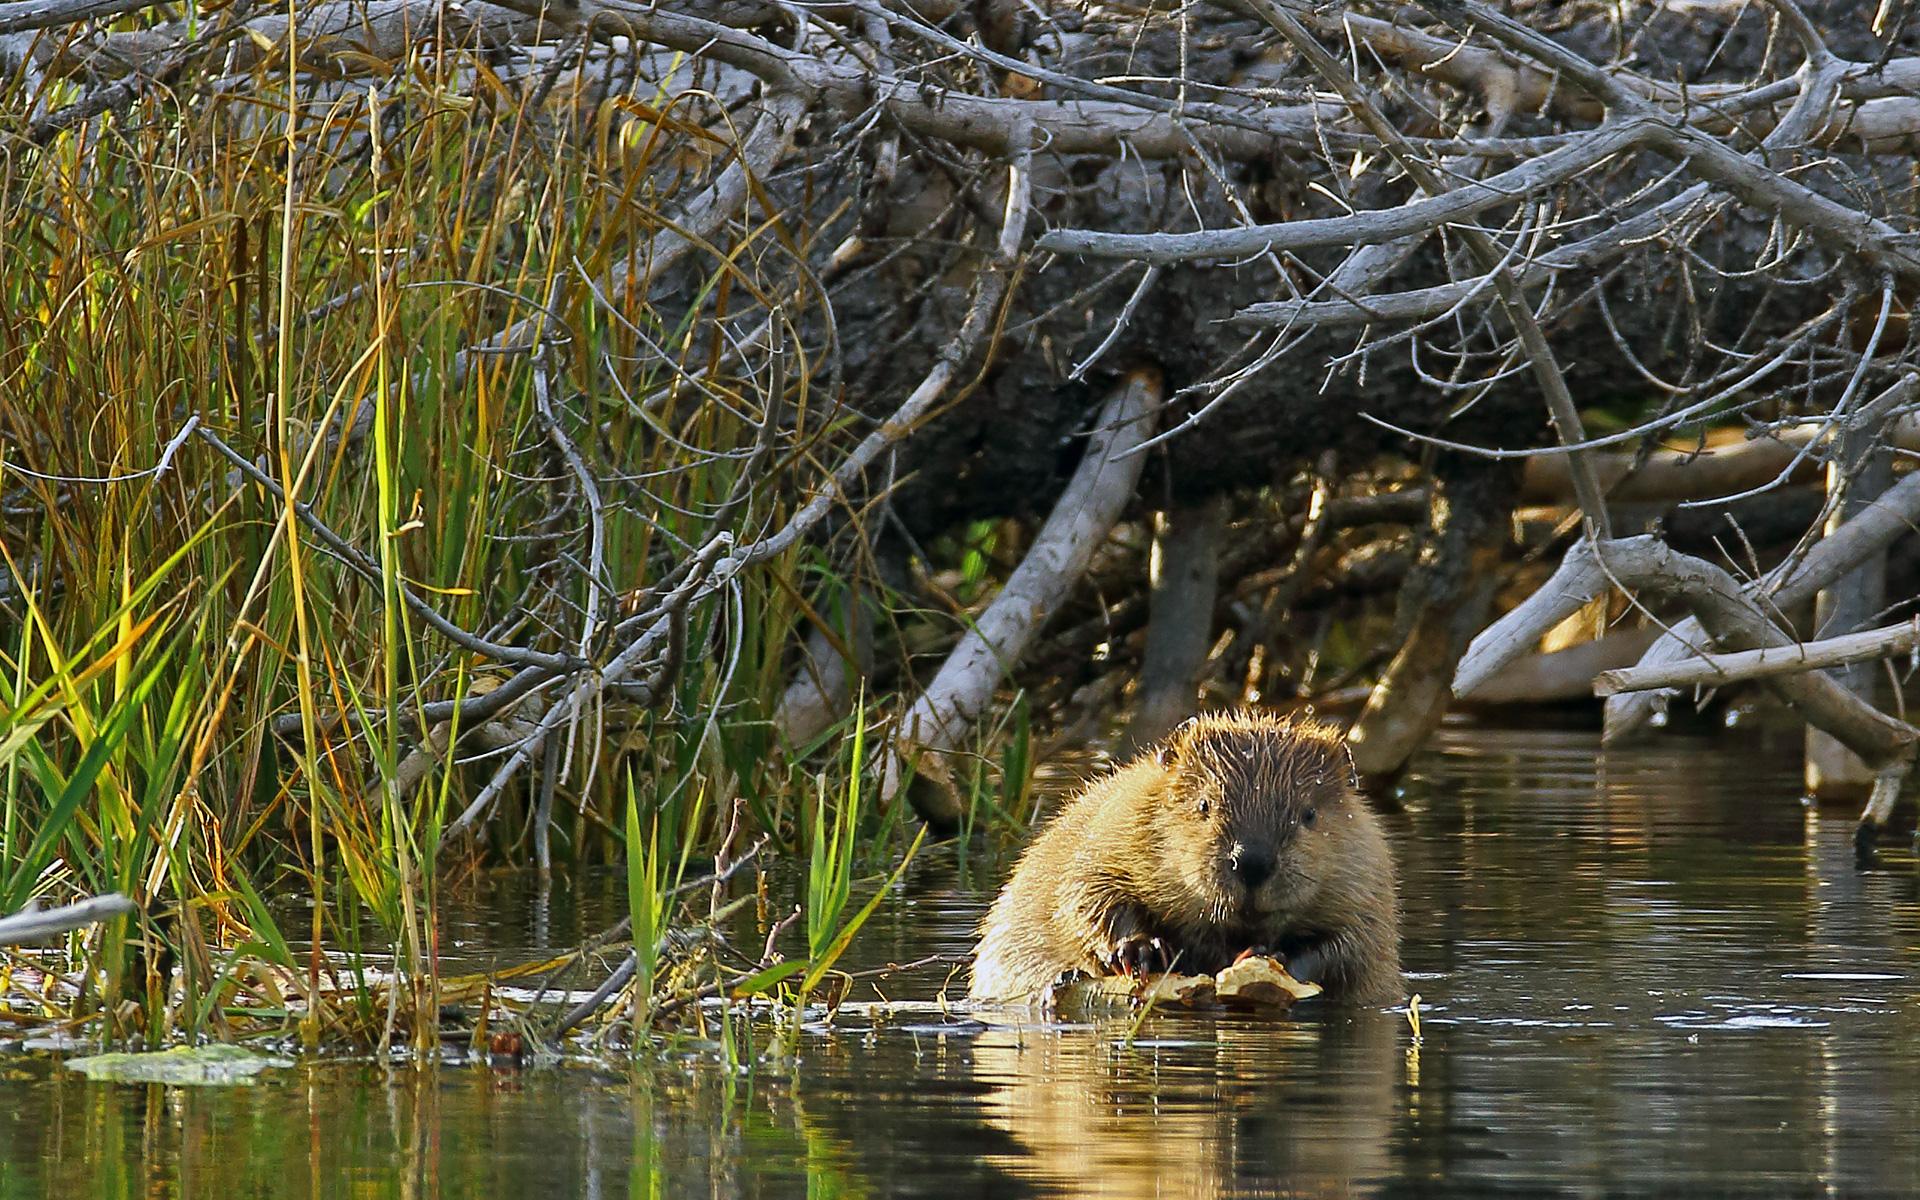 Wuskwatim is Cree for Beaver Dam